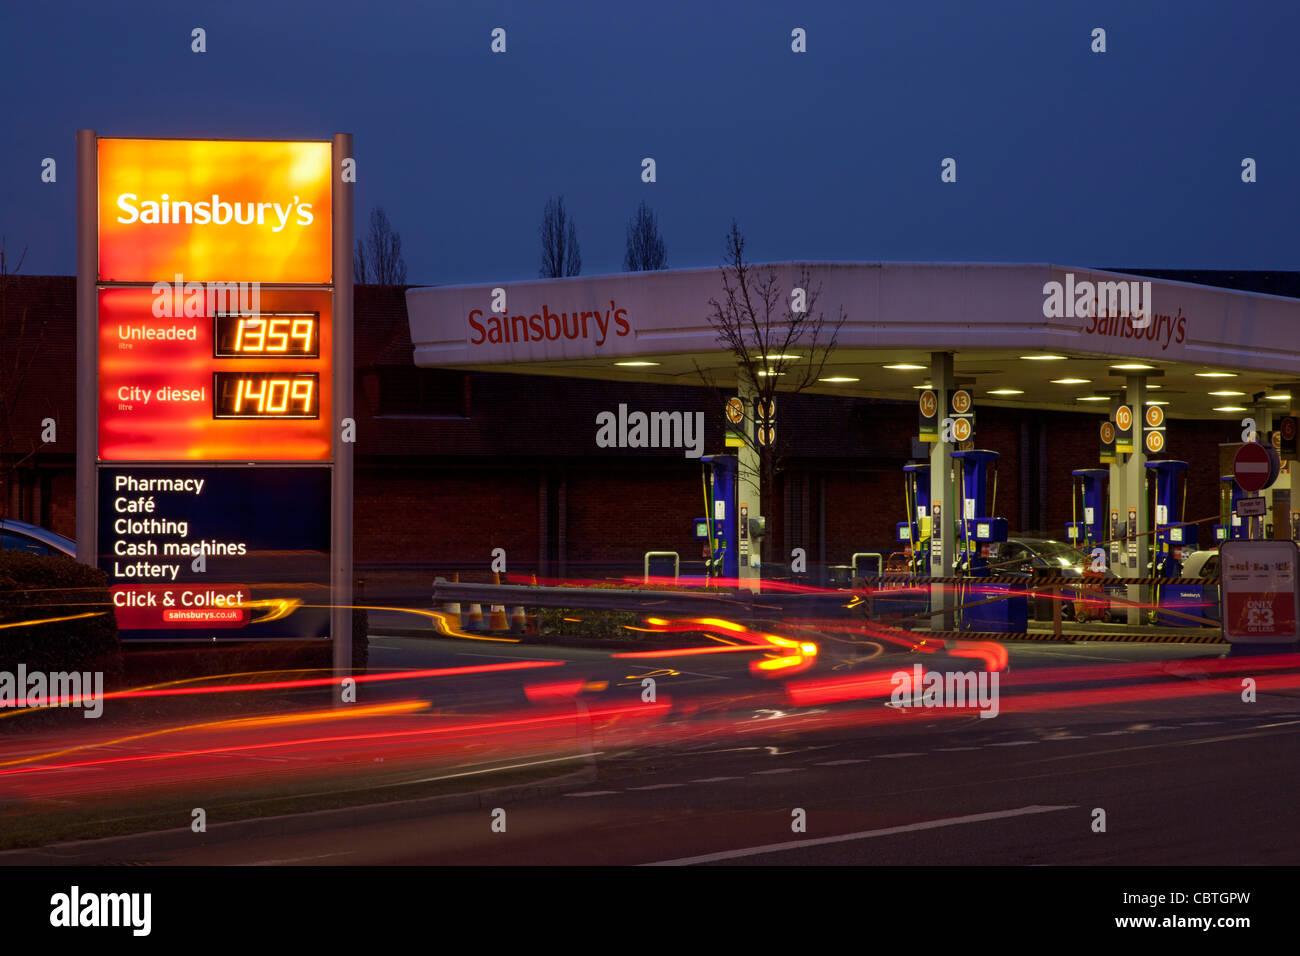 Sainsburys Fuel Garage forecourt at night, england, europe - Stock Image